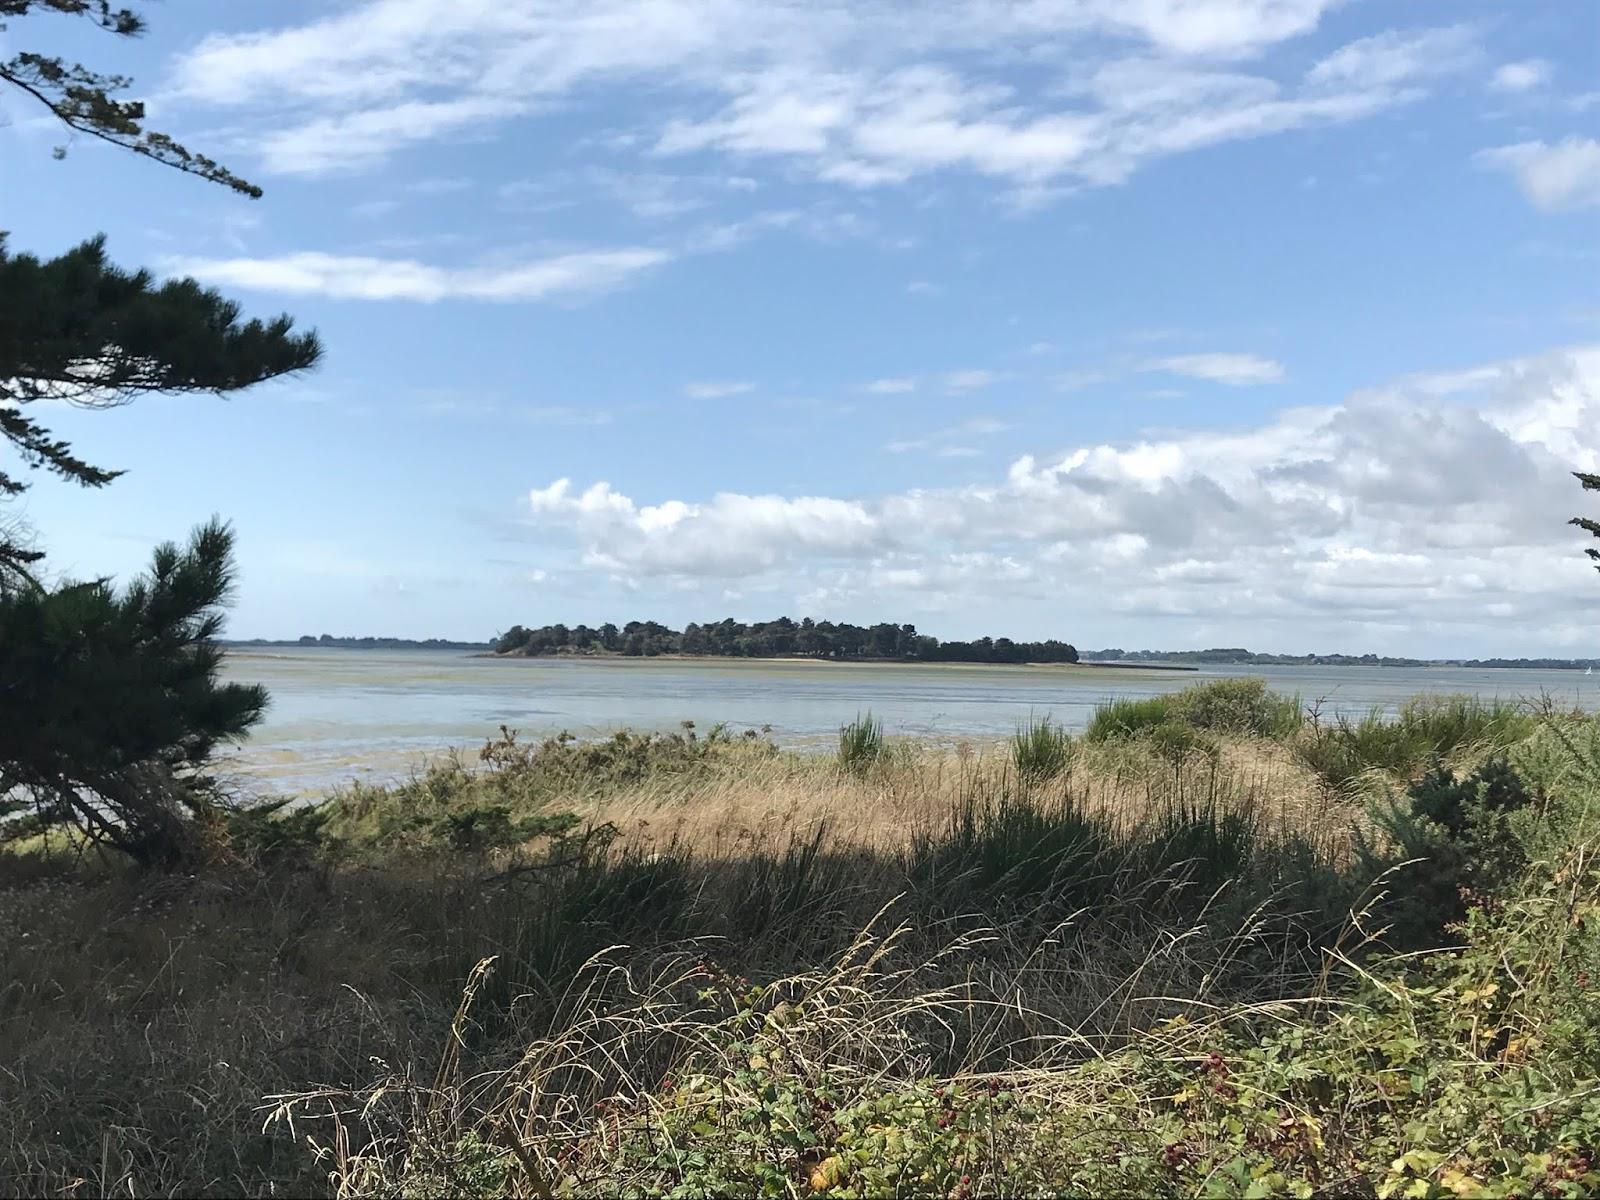 L'île Tascon